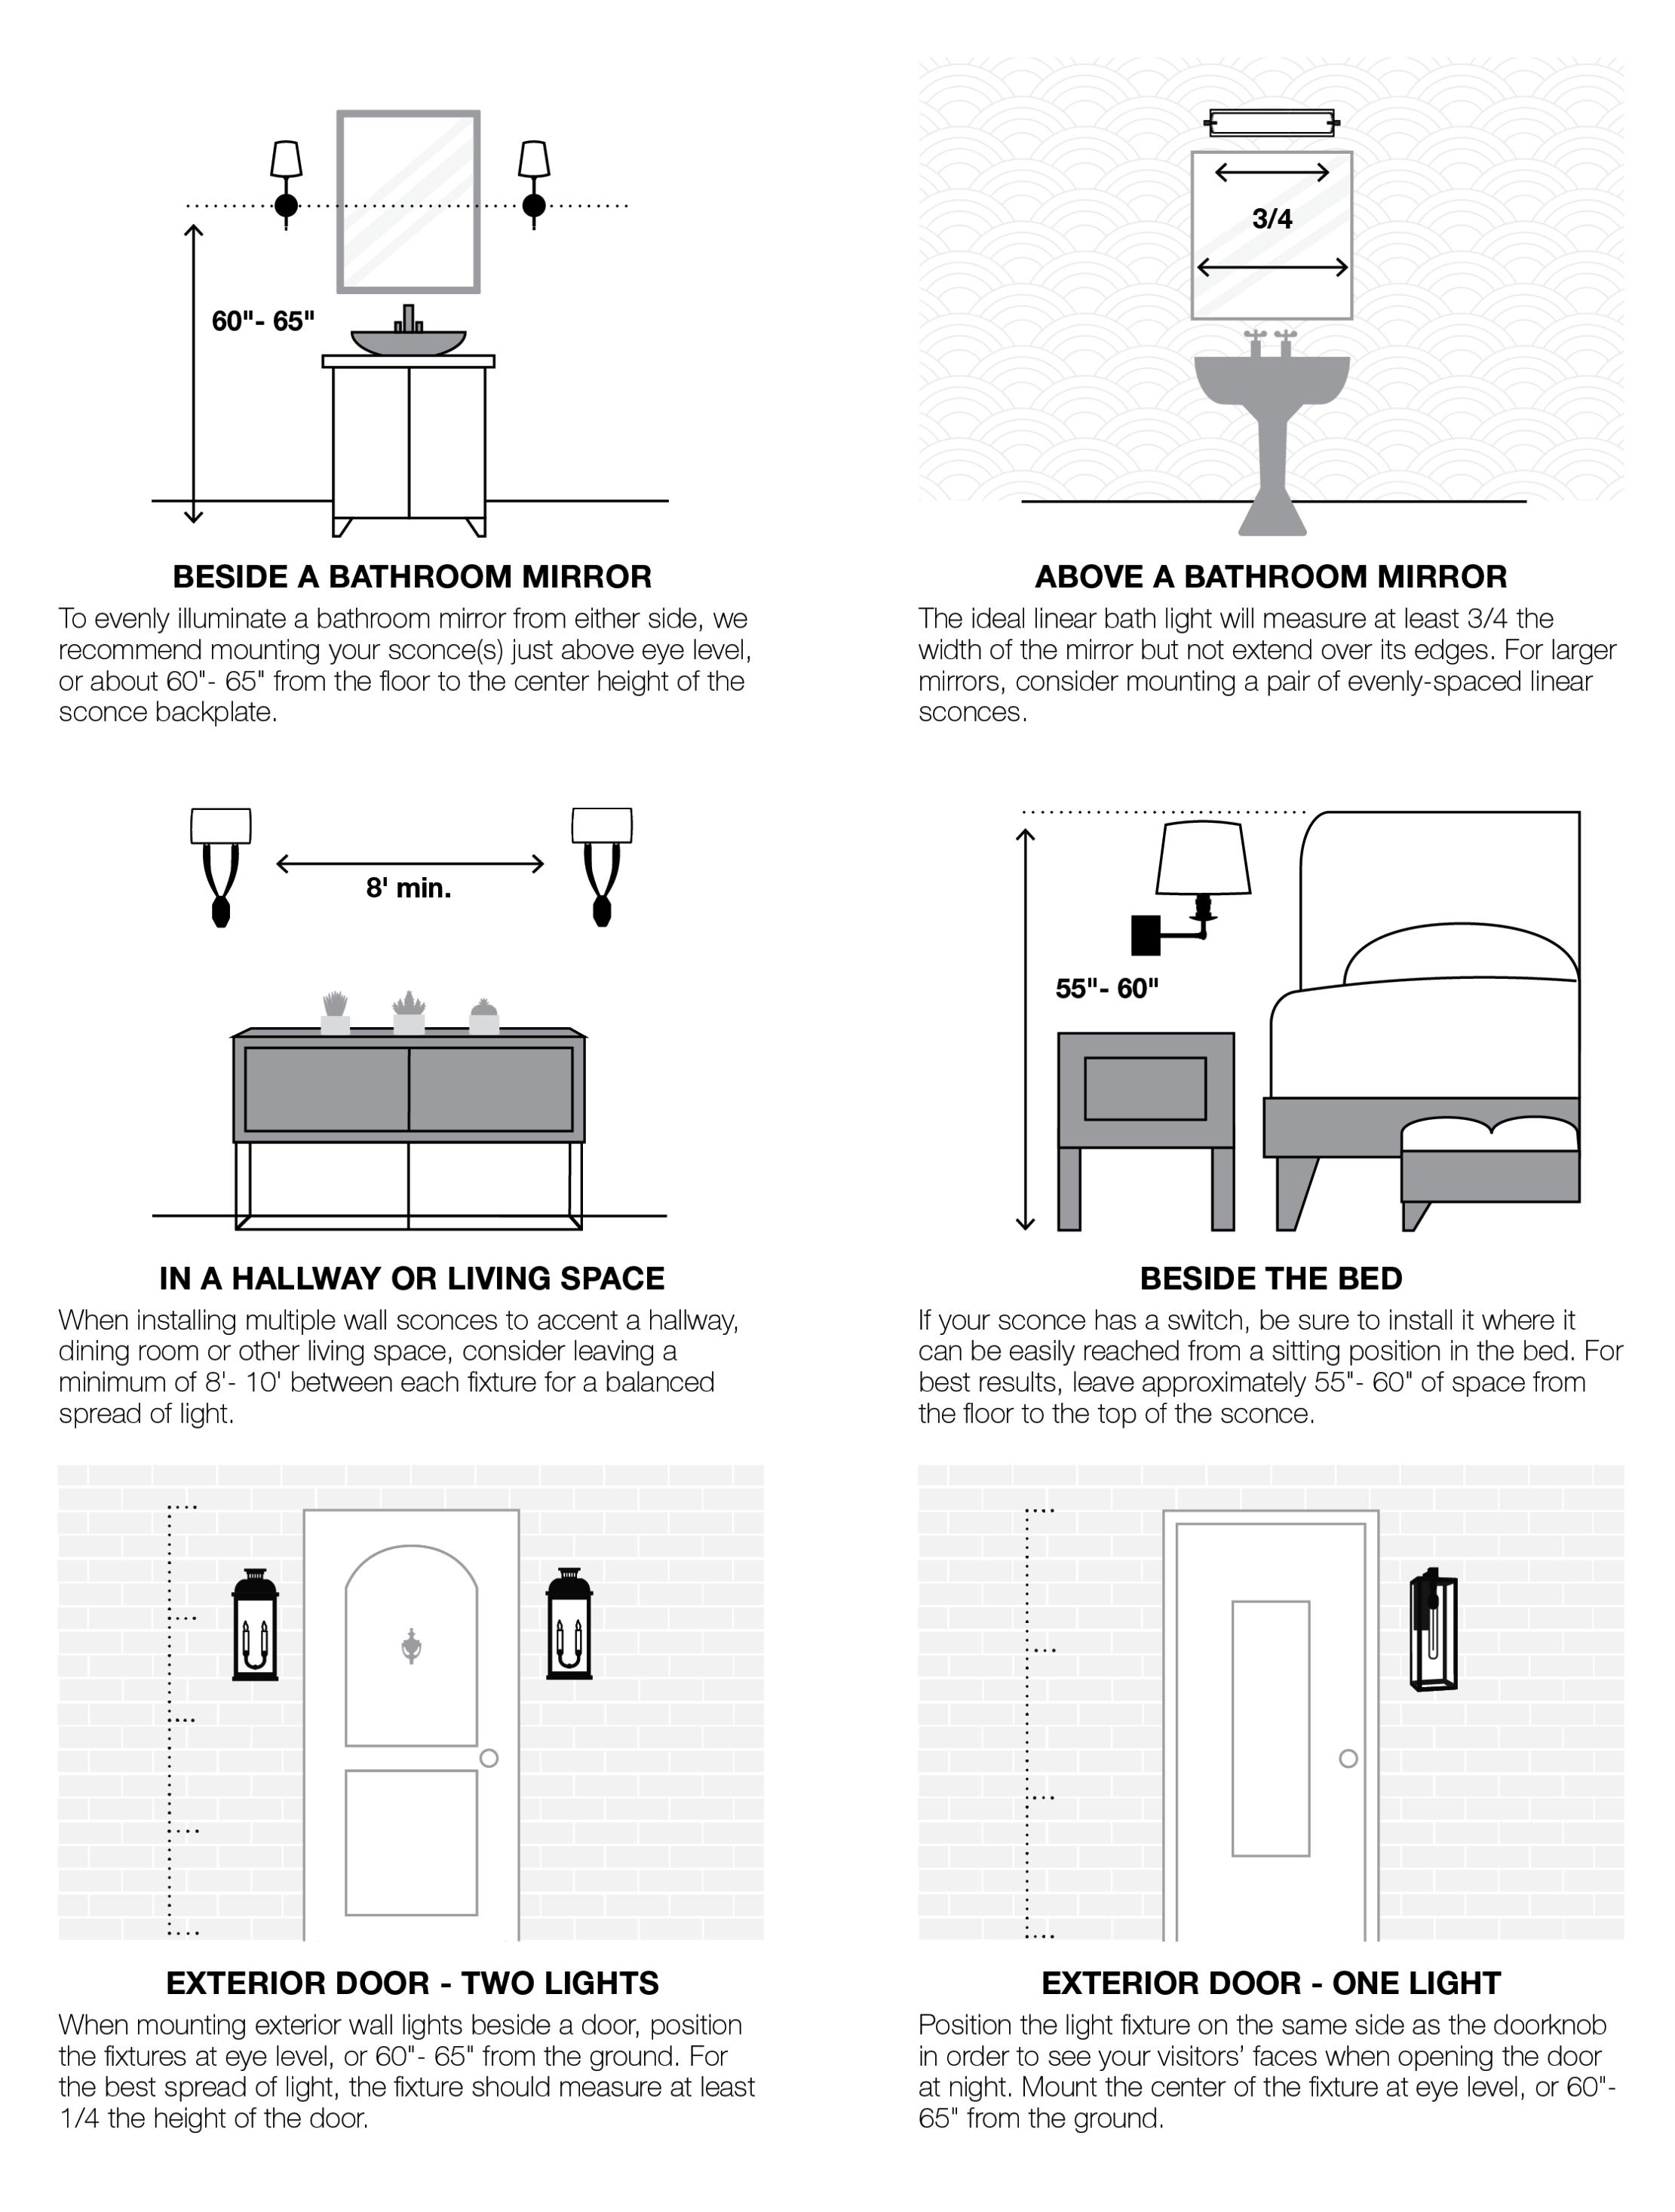 Landscape Gardening East Lothian inside Low Voltage Landscape ... on bathroom wiring code, bathroom cabinets diagram, bathroom light wiring, gfci diagram, cctv diagram, bathroom switch diagram, bathroom plumbing diagram, bathroom valves, bathroom outlet diagram, bathroom exhaust diagram, bathroom heater diagram, bathroom dimensions, electrical diagram, bathroom framing diagram, bathroom lighting, bathroom drain pipe diagram, bathroom piping diagram,